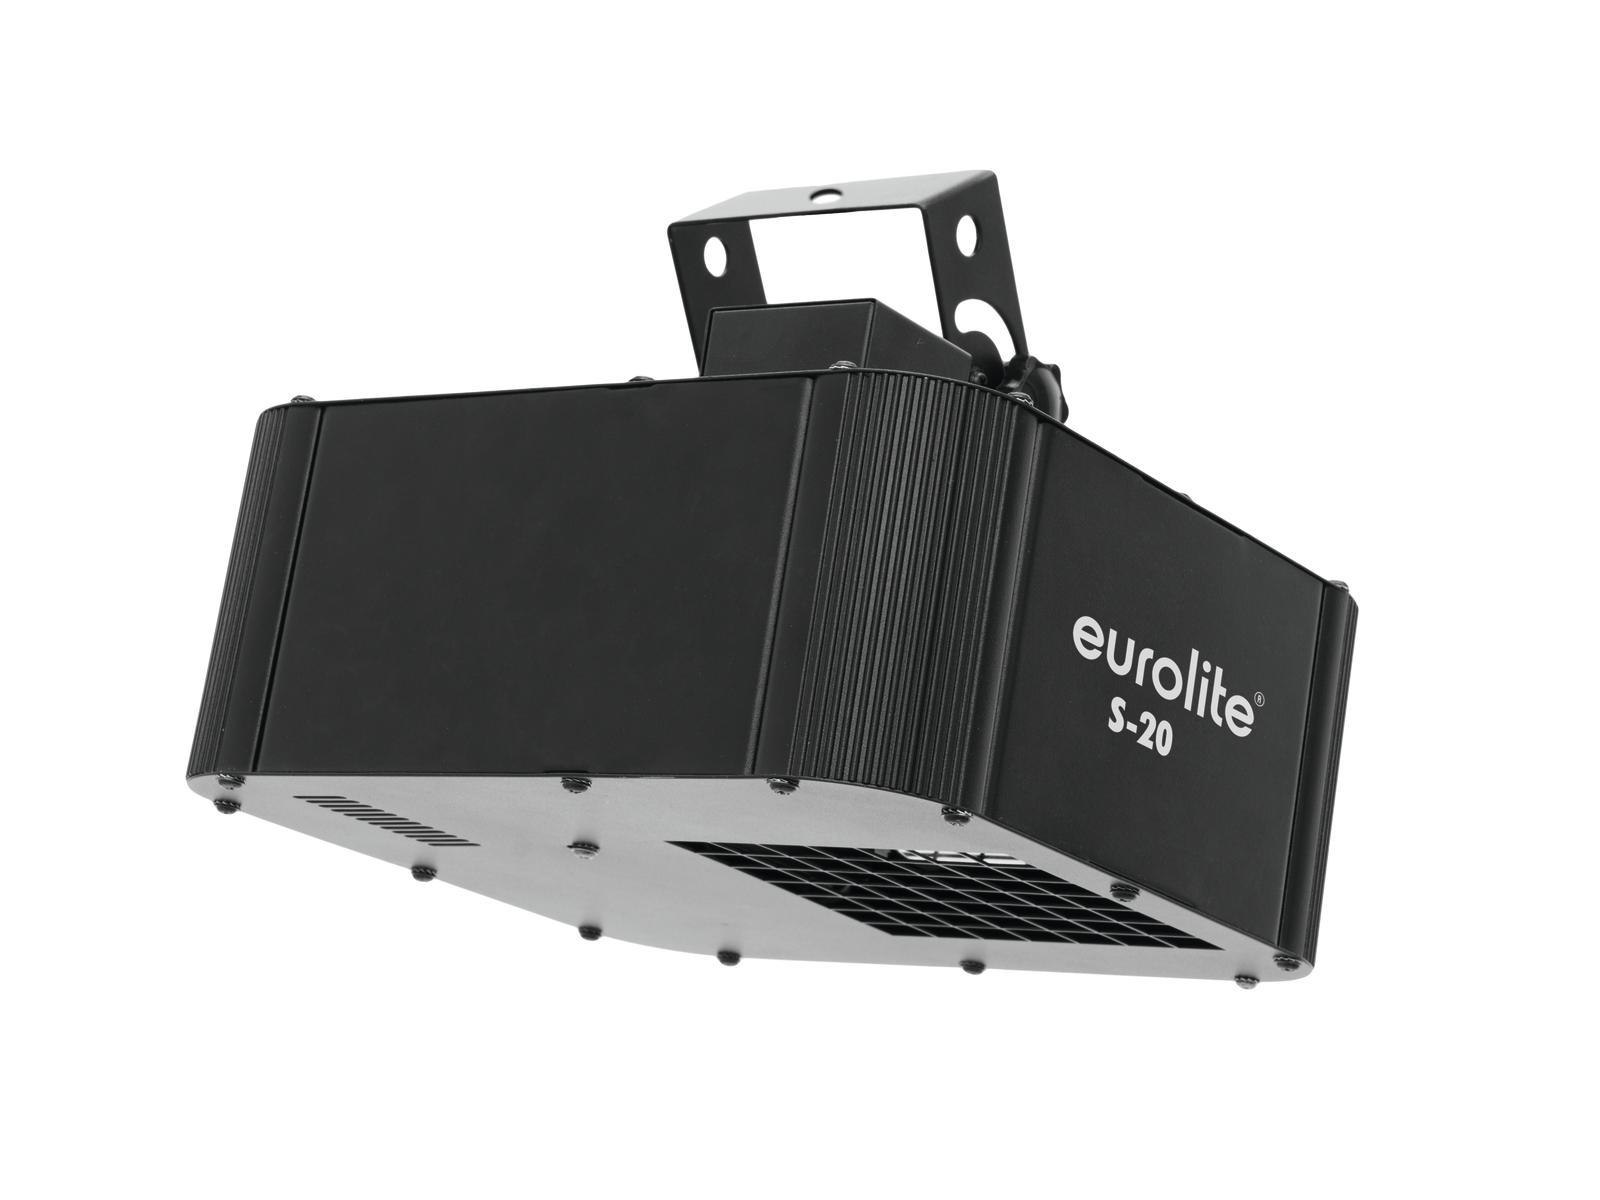 Eurolite LED S-20 simulátor laseru